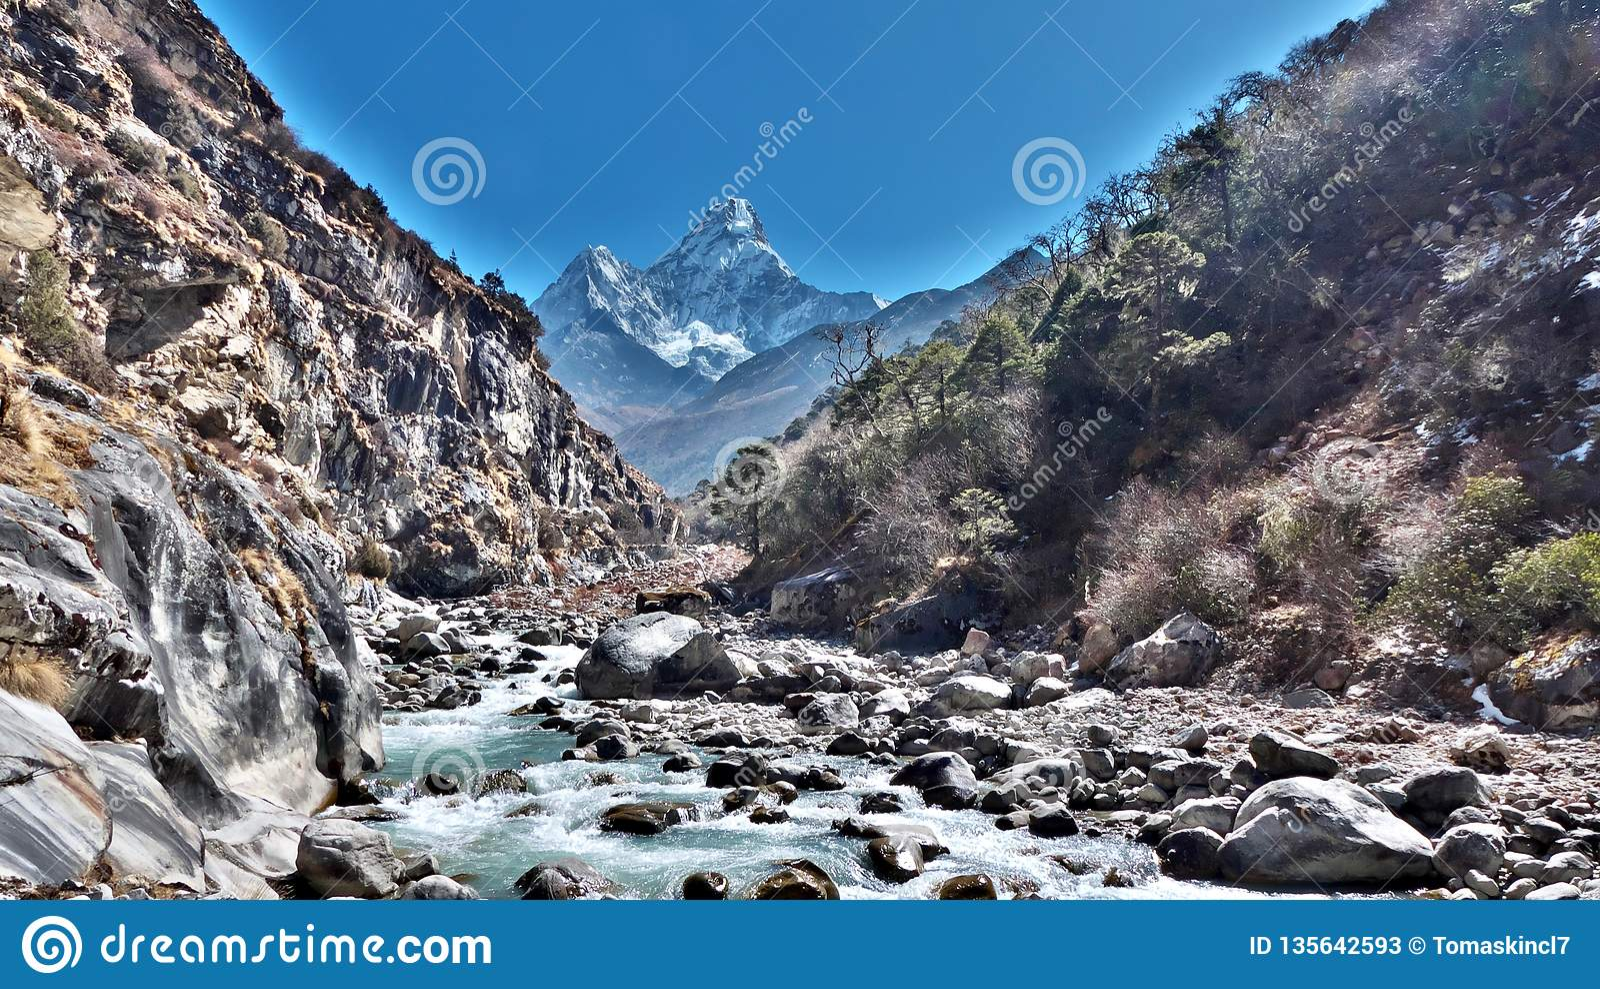 Ama Dablam i bakgrunden, flod mellan berg